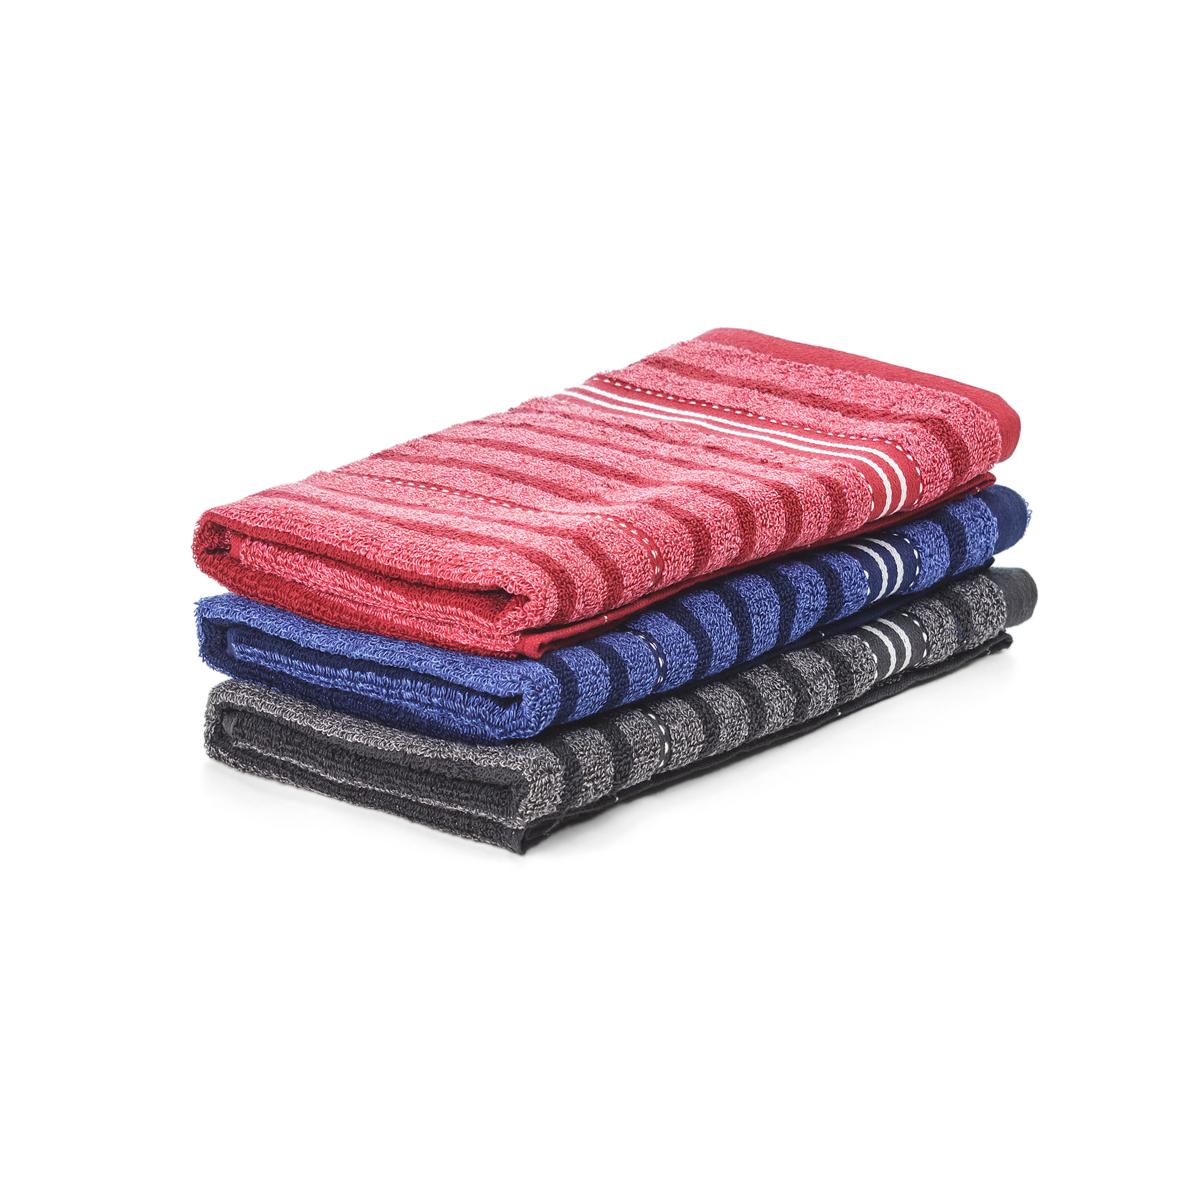 Полотенце арт. 04-0031 Красный р. 50х90Махровые полотенца<br><br><br>Тип: Полотенце<br>Размер: 50х90<br>Материал: Махра